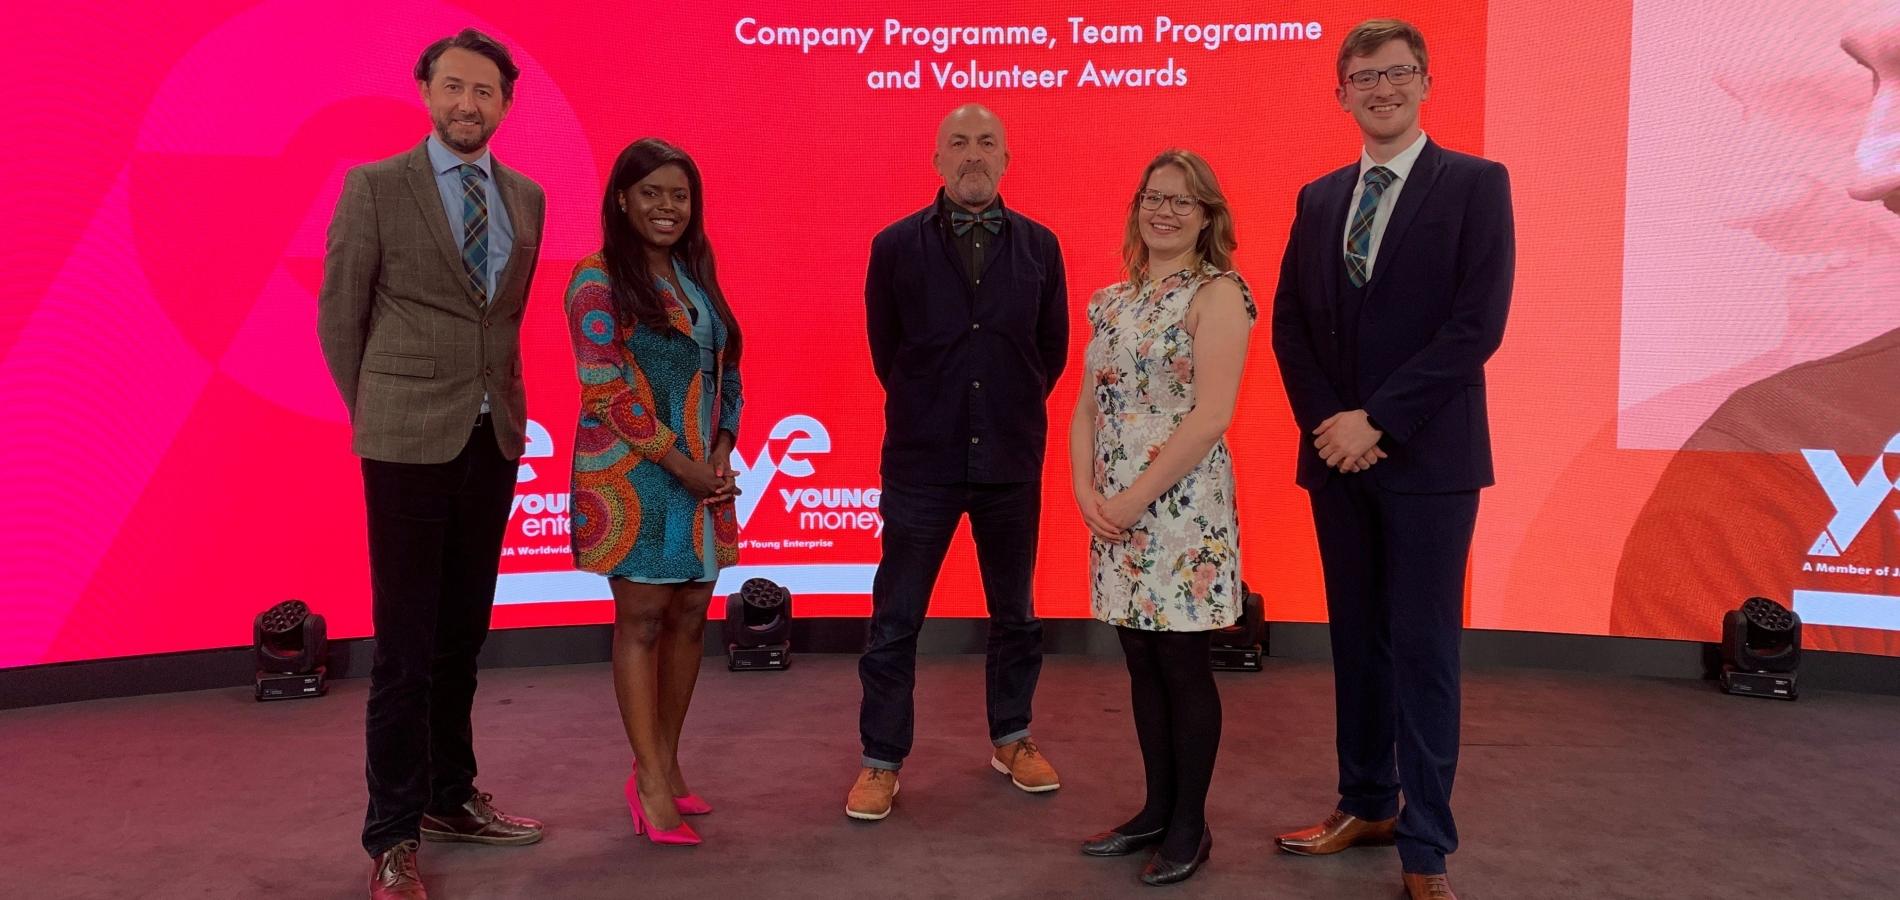 FoYE21: Company Programme, Team Programme and Volunteer Awards